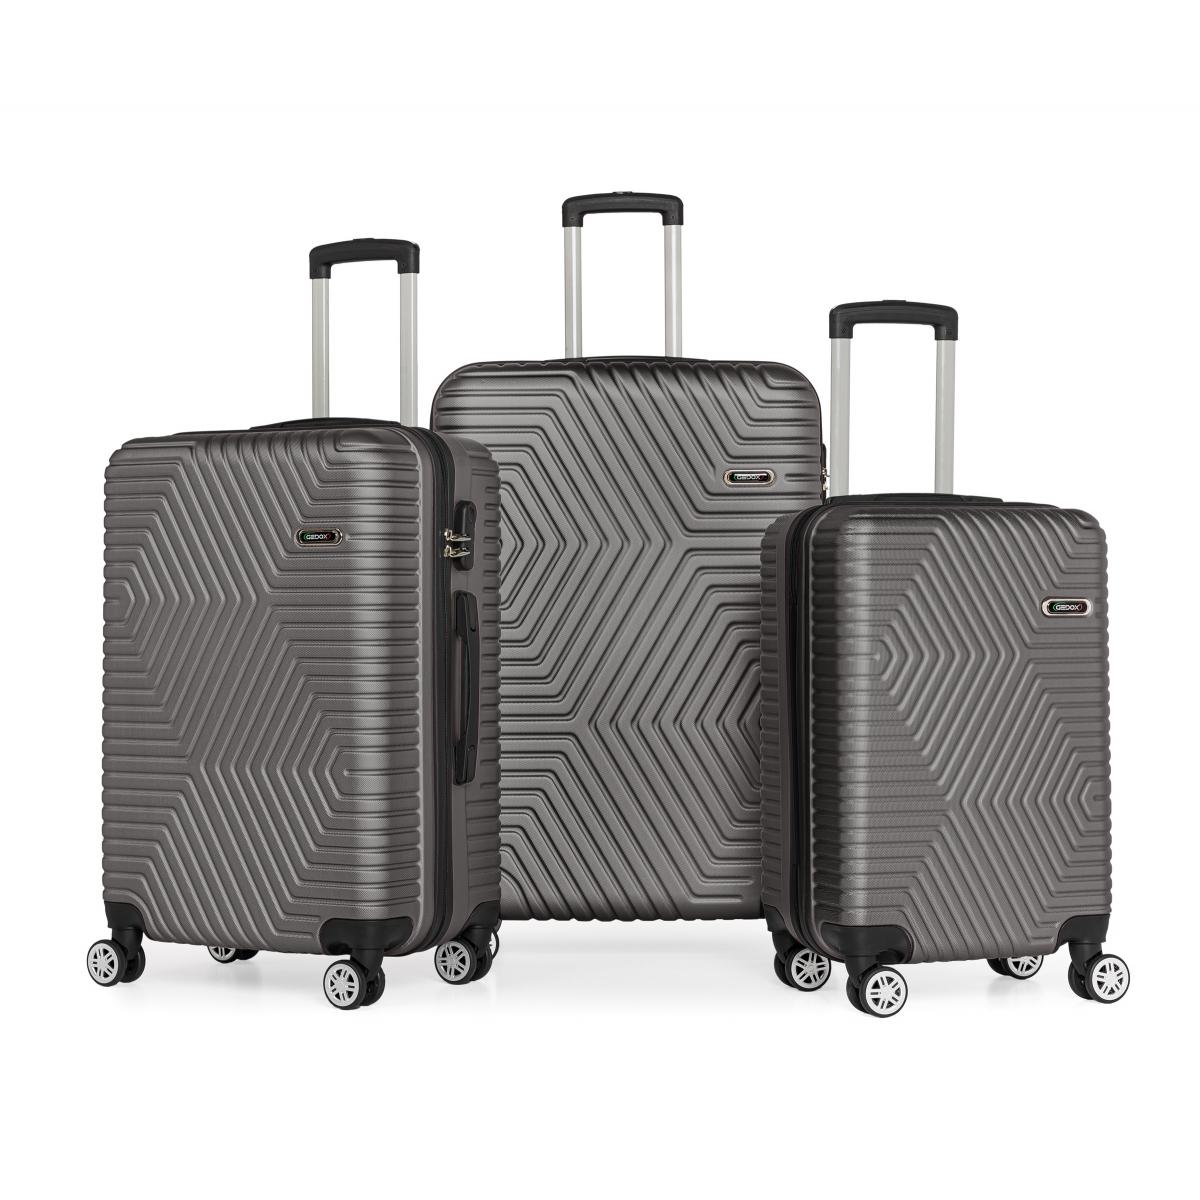 G&D Polo Suitcase ABS 3'lü Lüx Valiz Seyahat Seti - Model:600.02 Koyu Gri